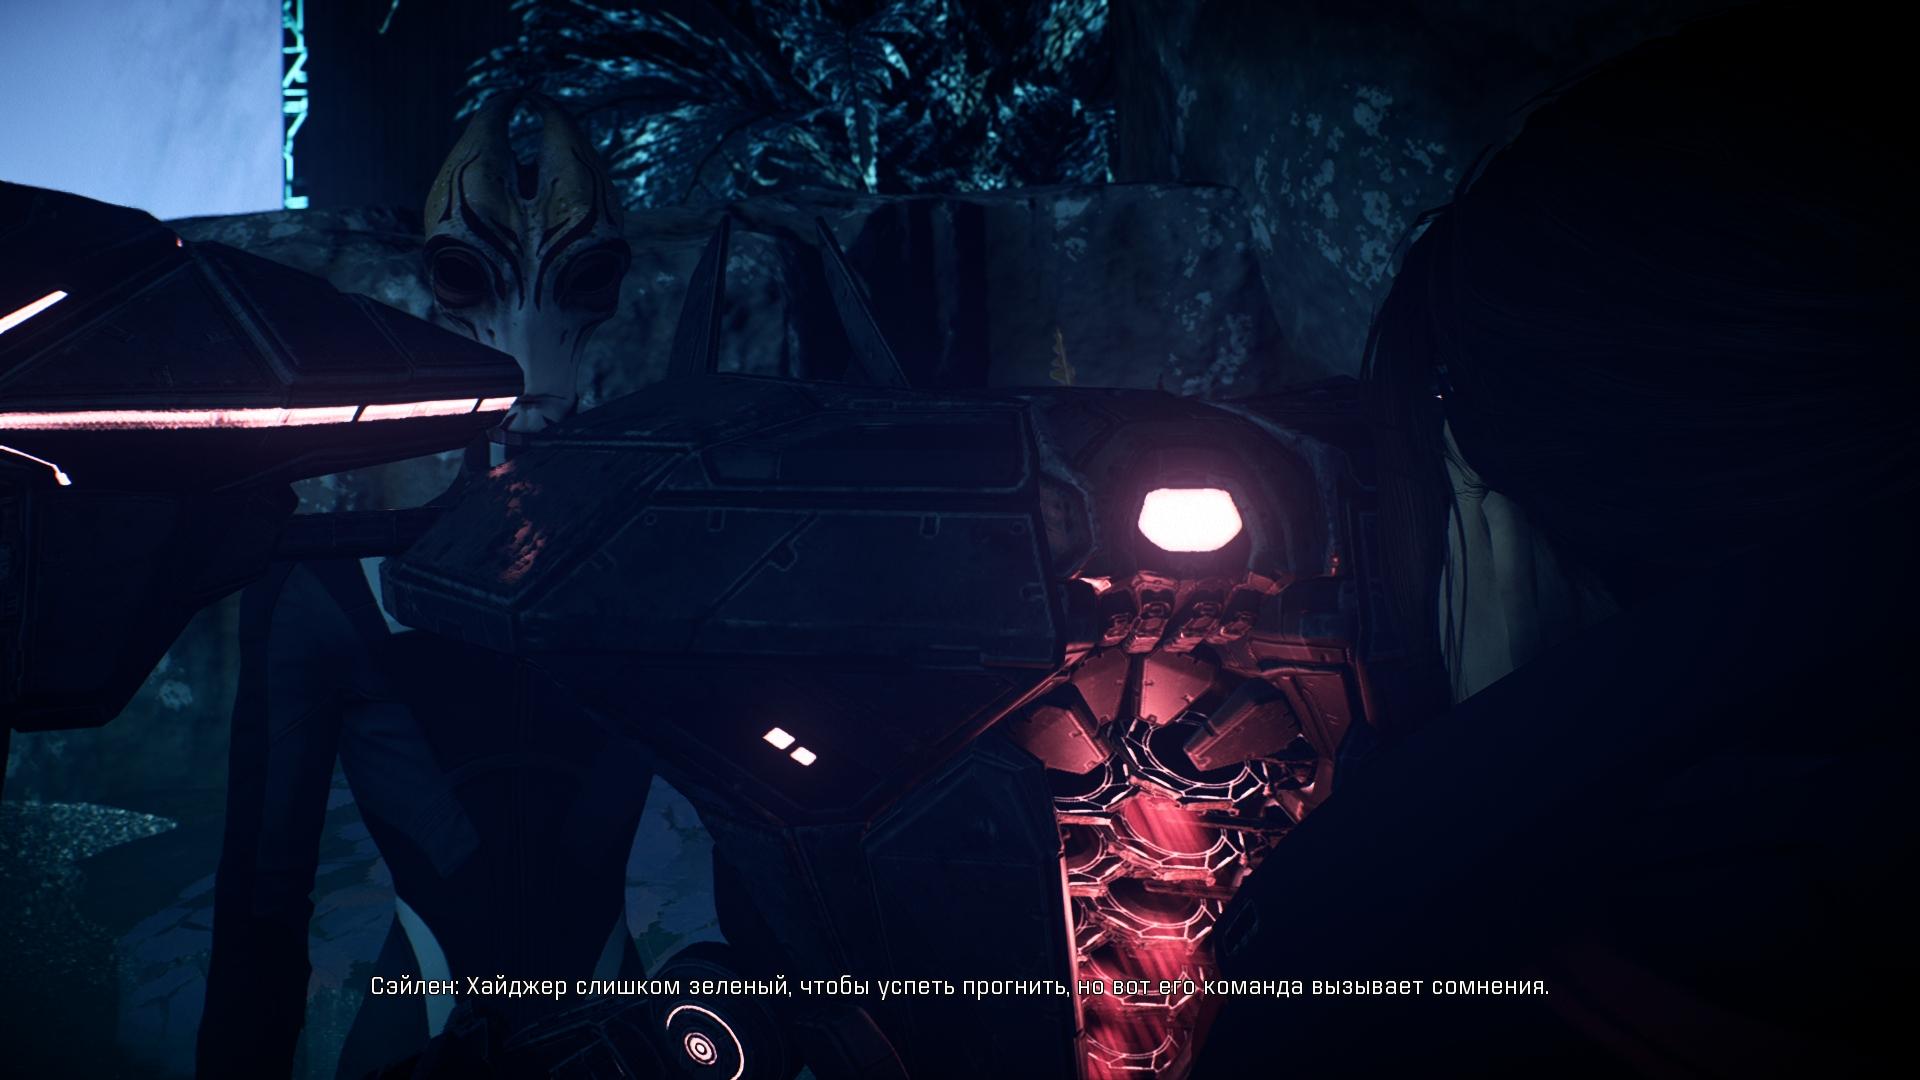 LOL - Mass Effect: Andromeda